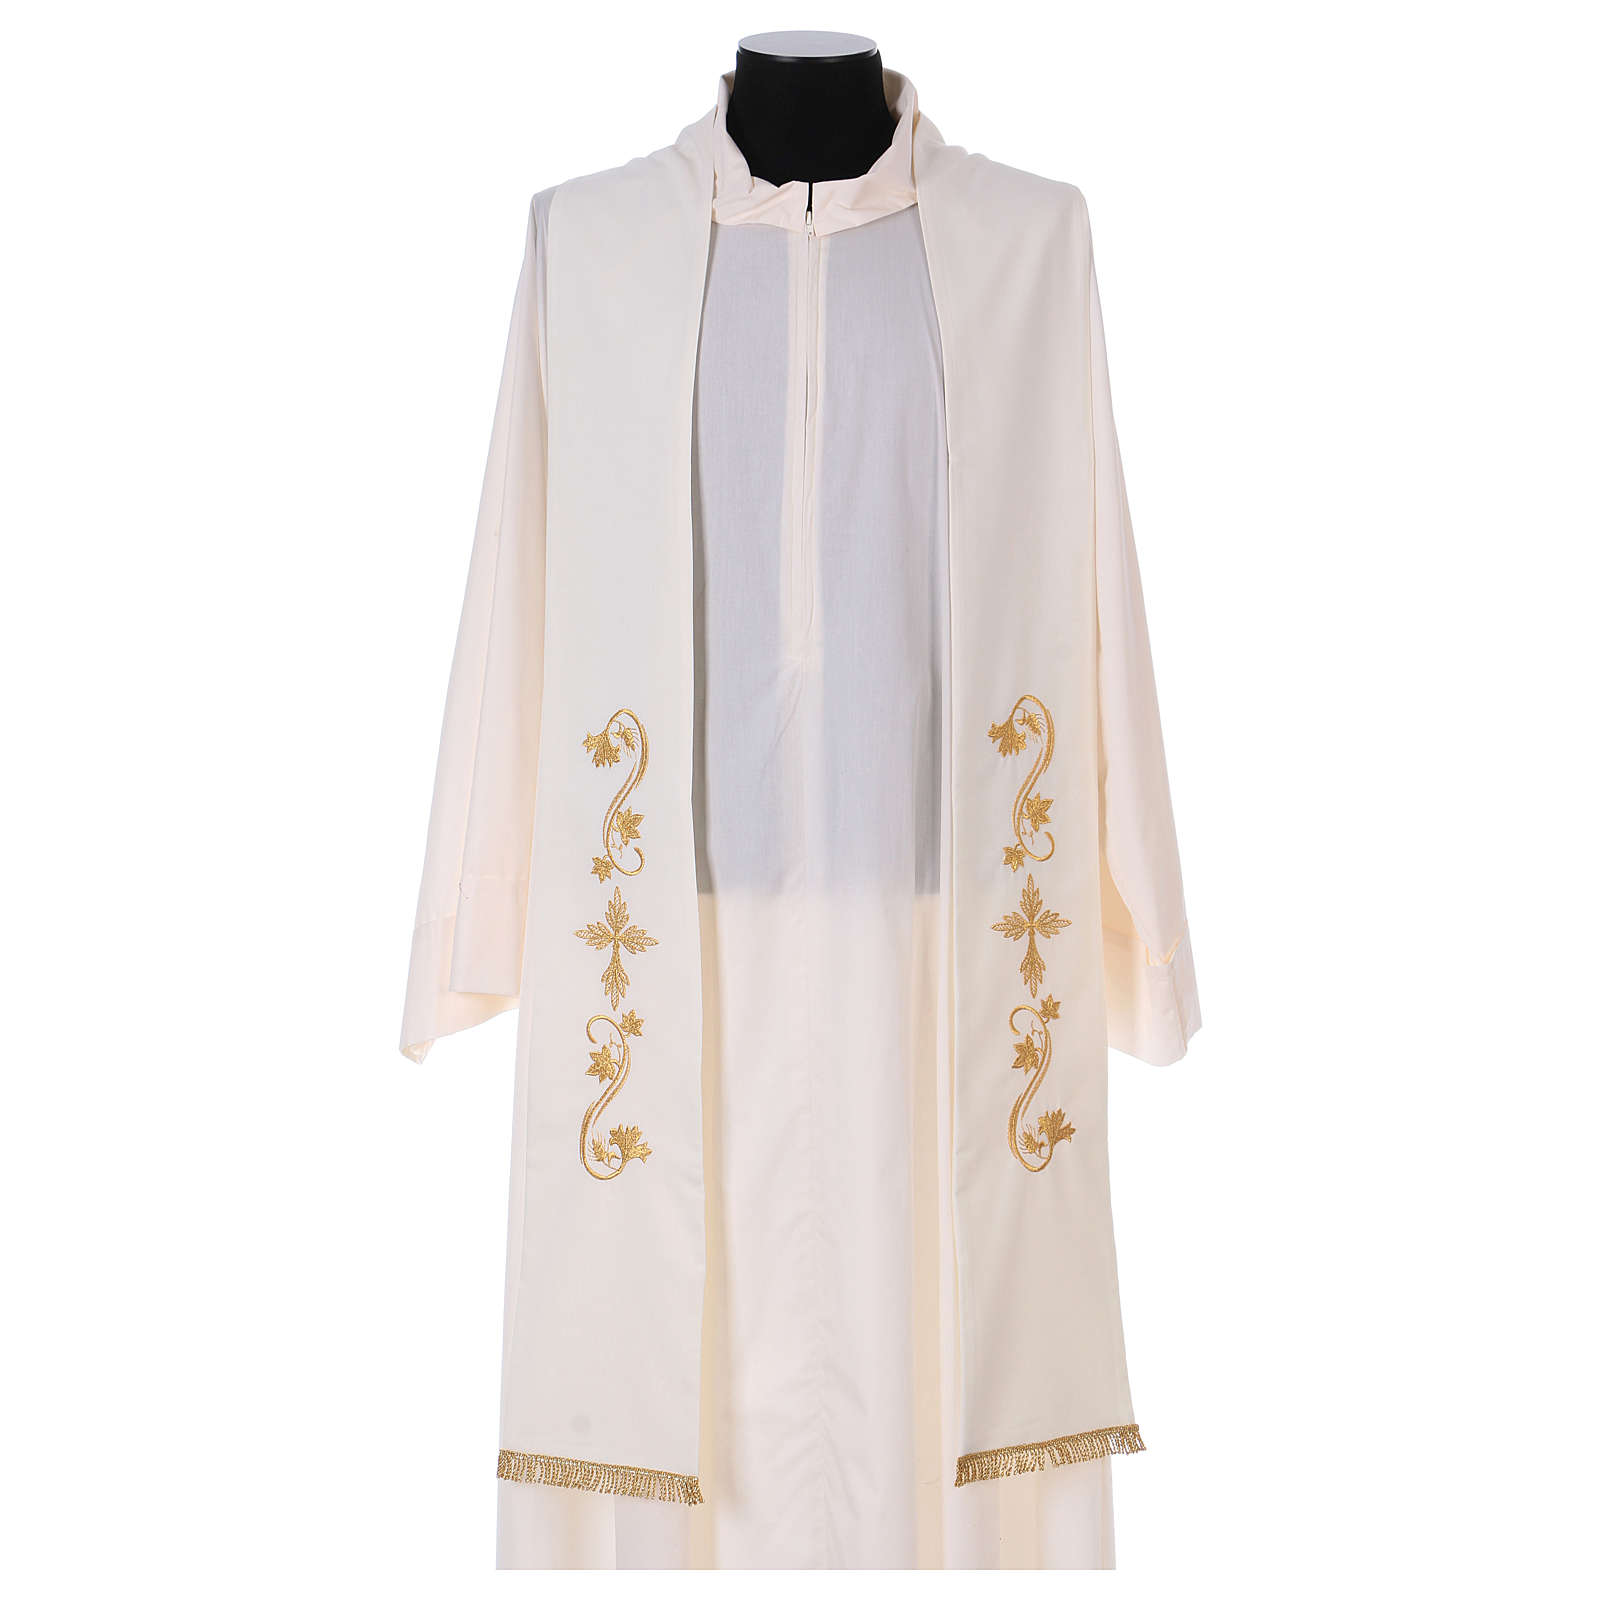 Étole prêtre tissu Vatican 4